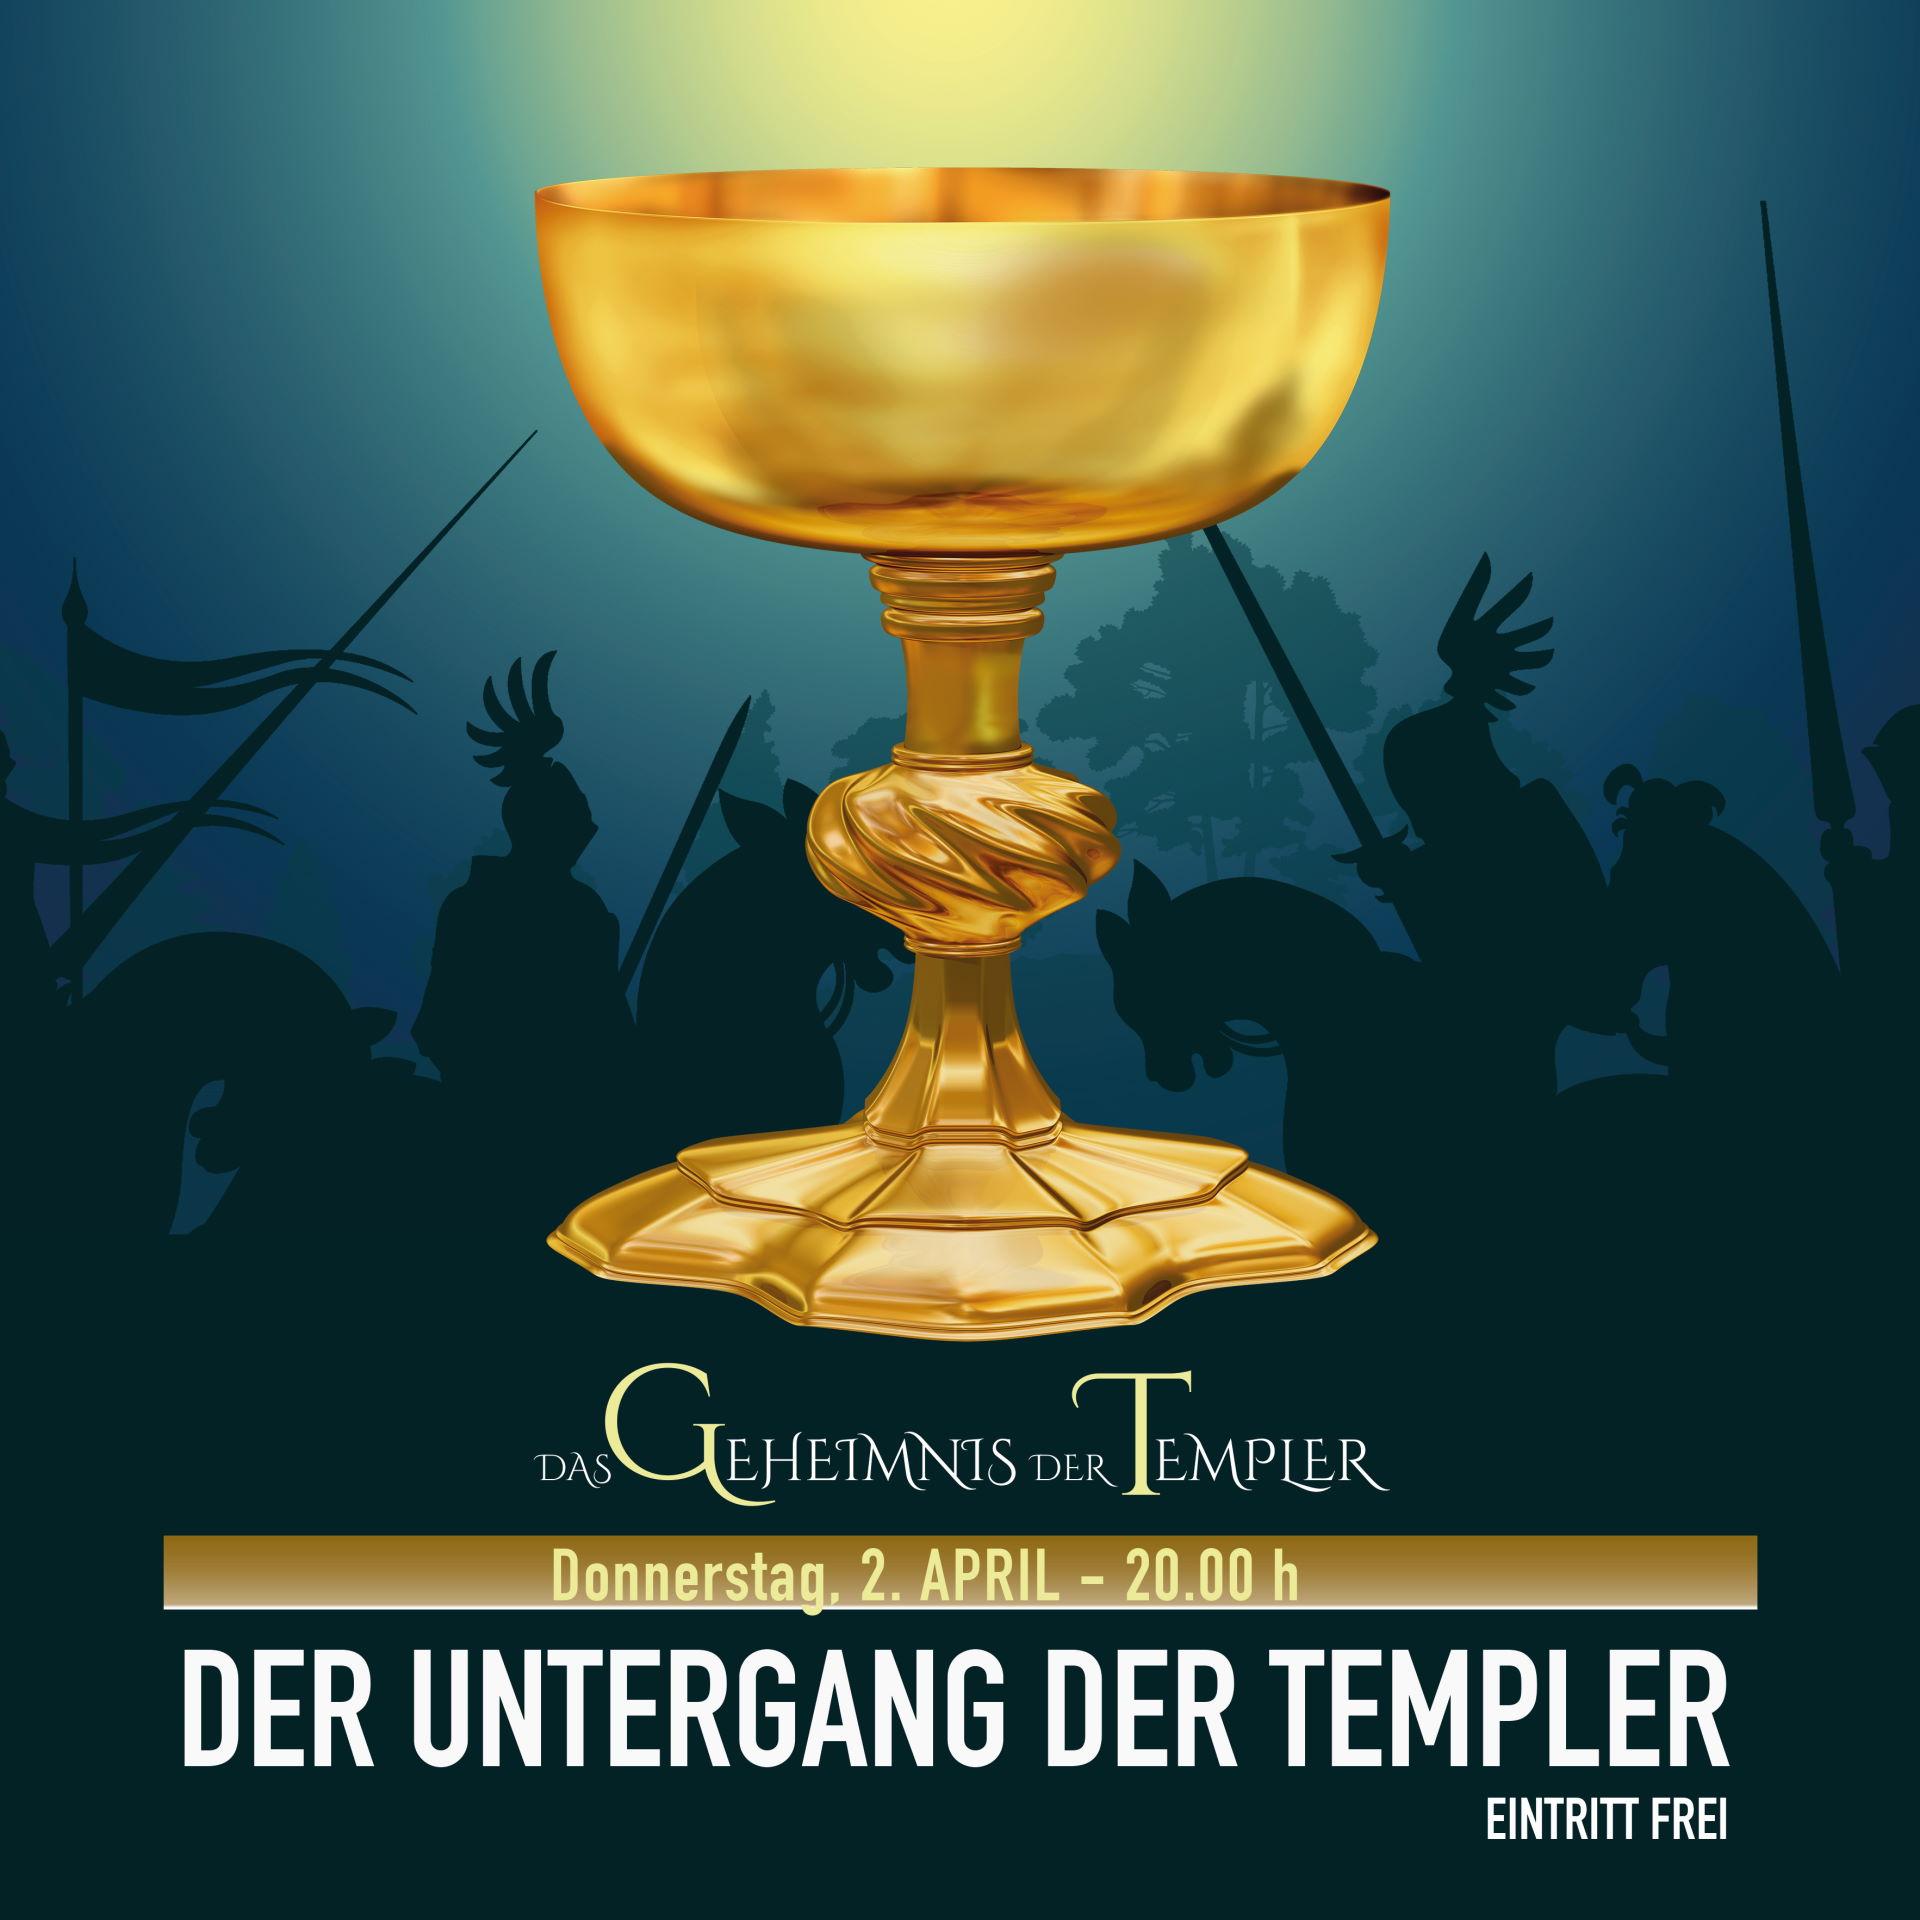 Das Geheimnis der Templer - Der Untergang der Templer